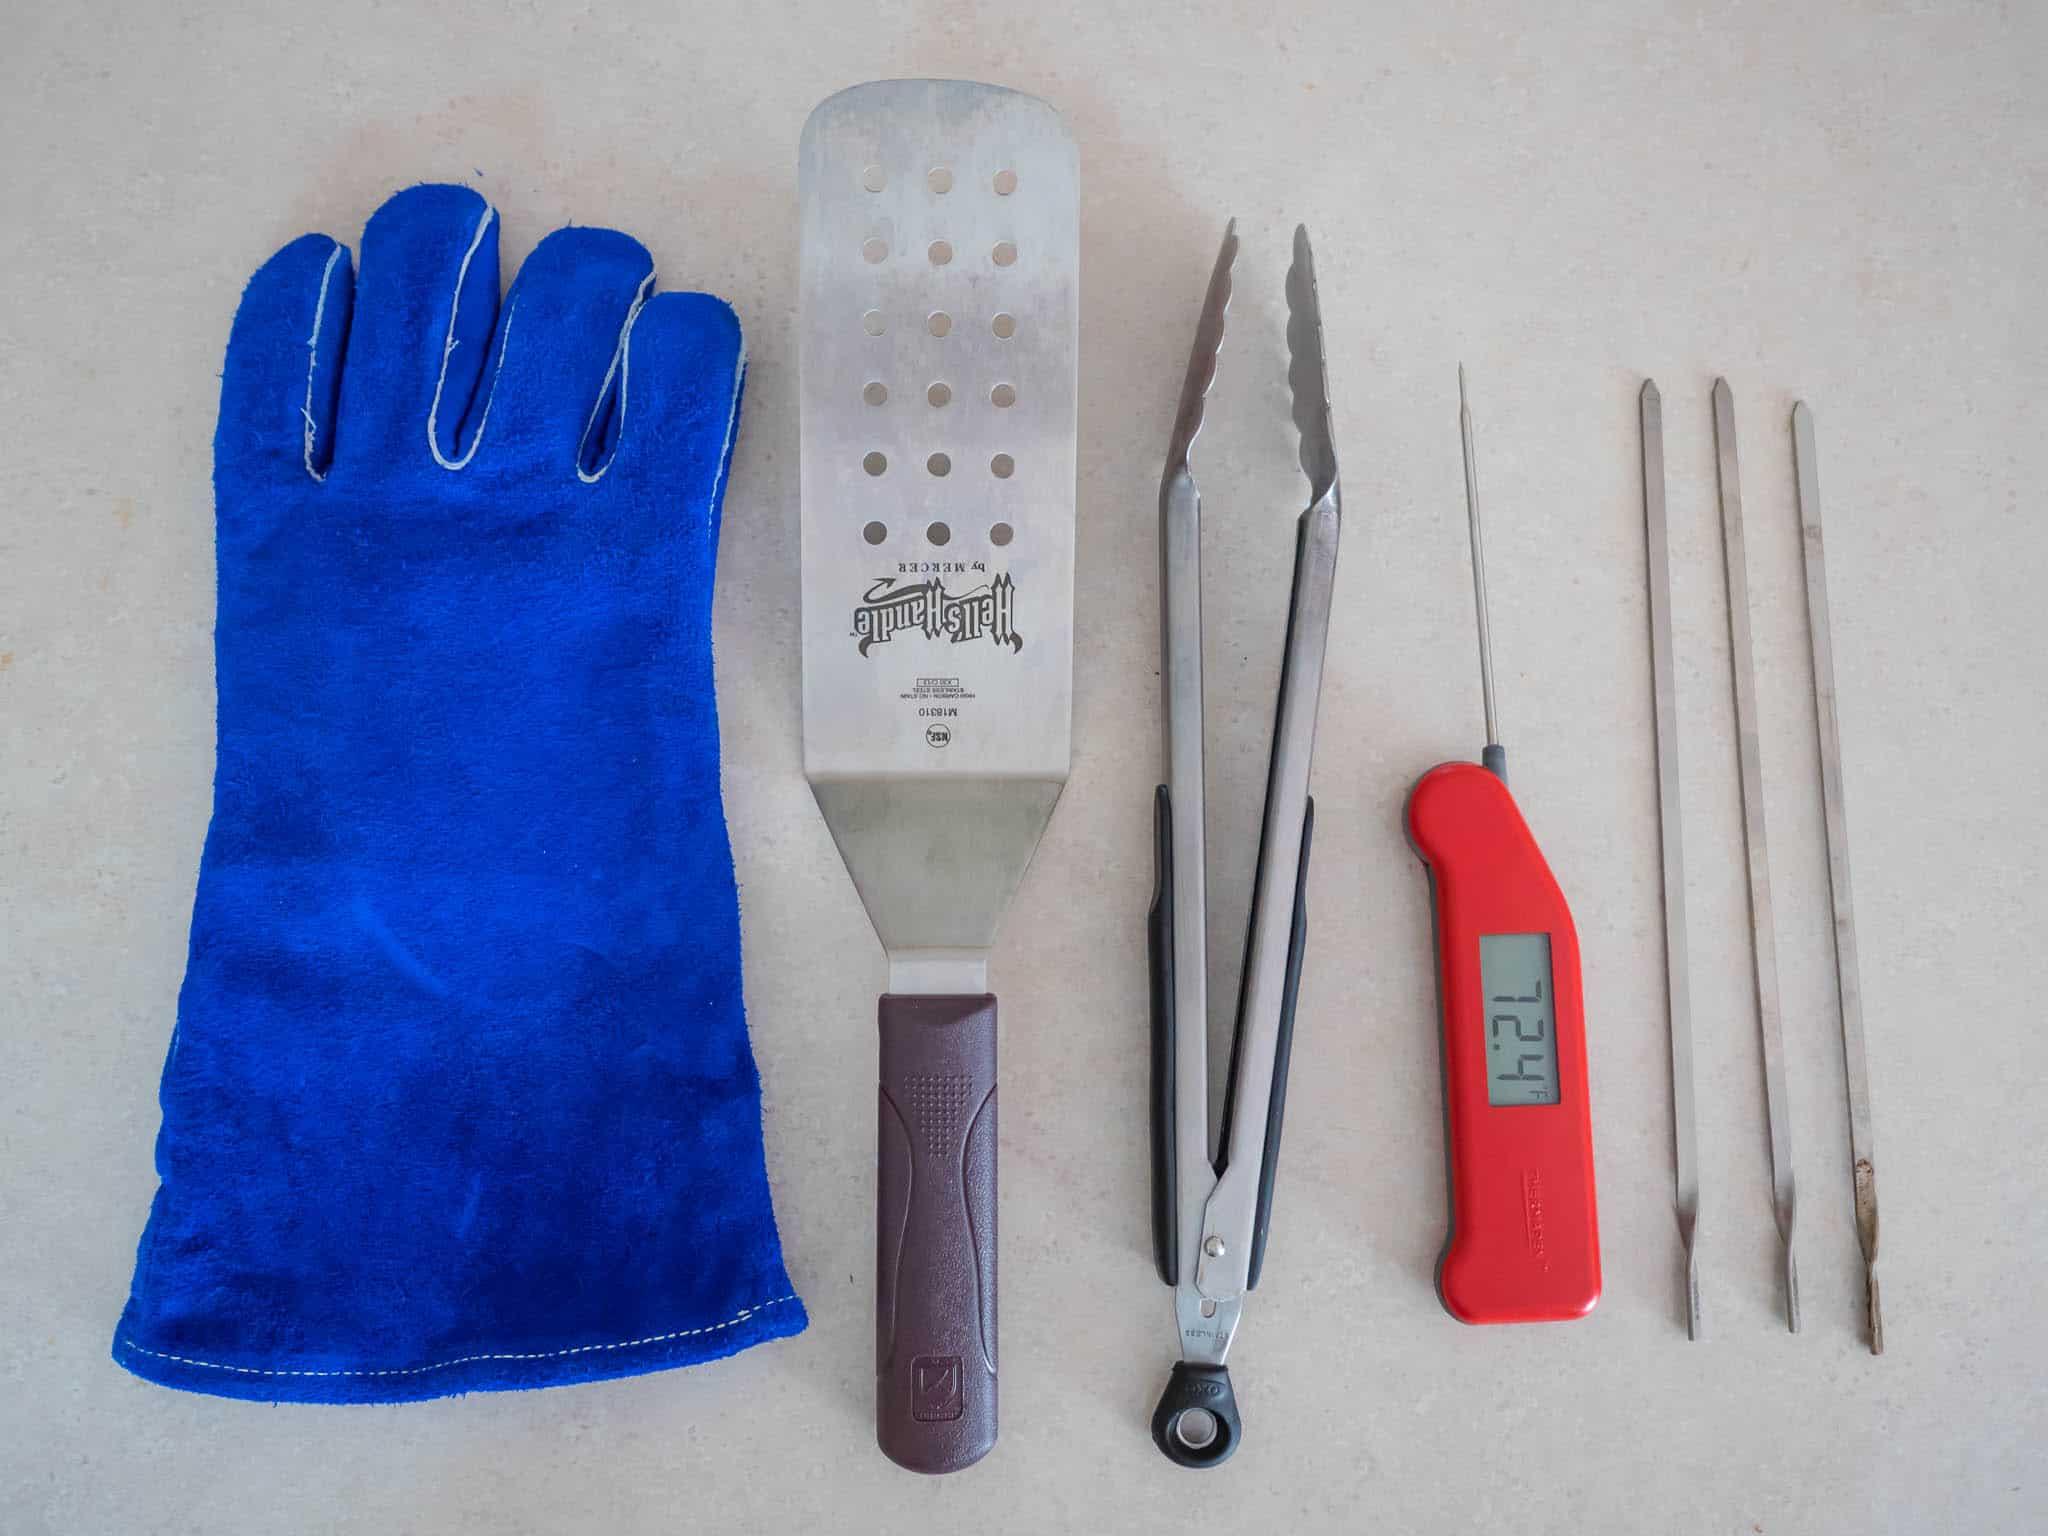 grilling tools - Grilling Tools